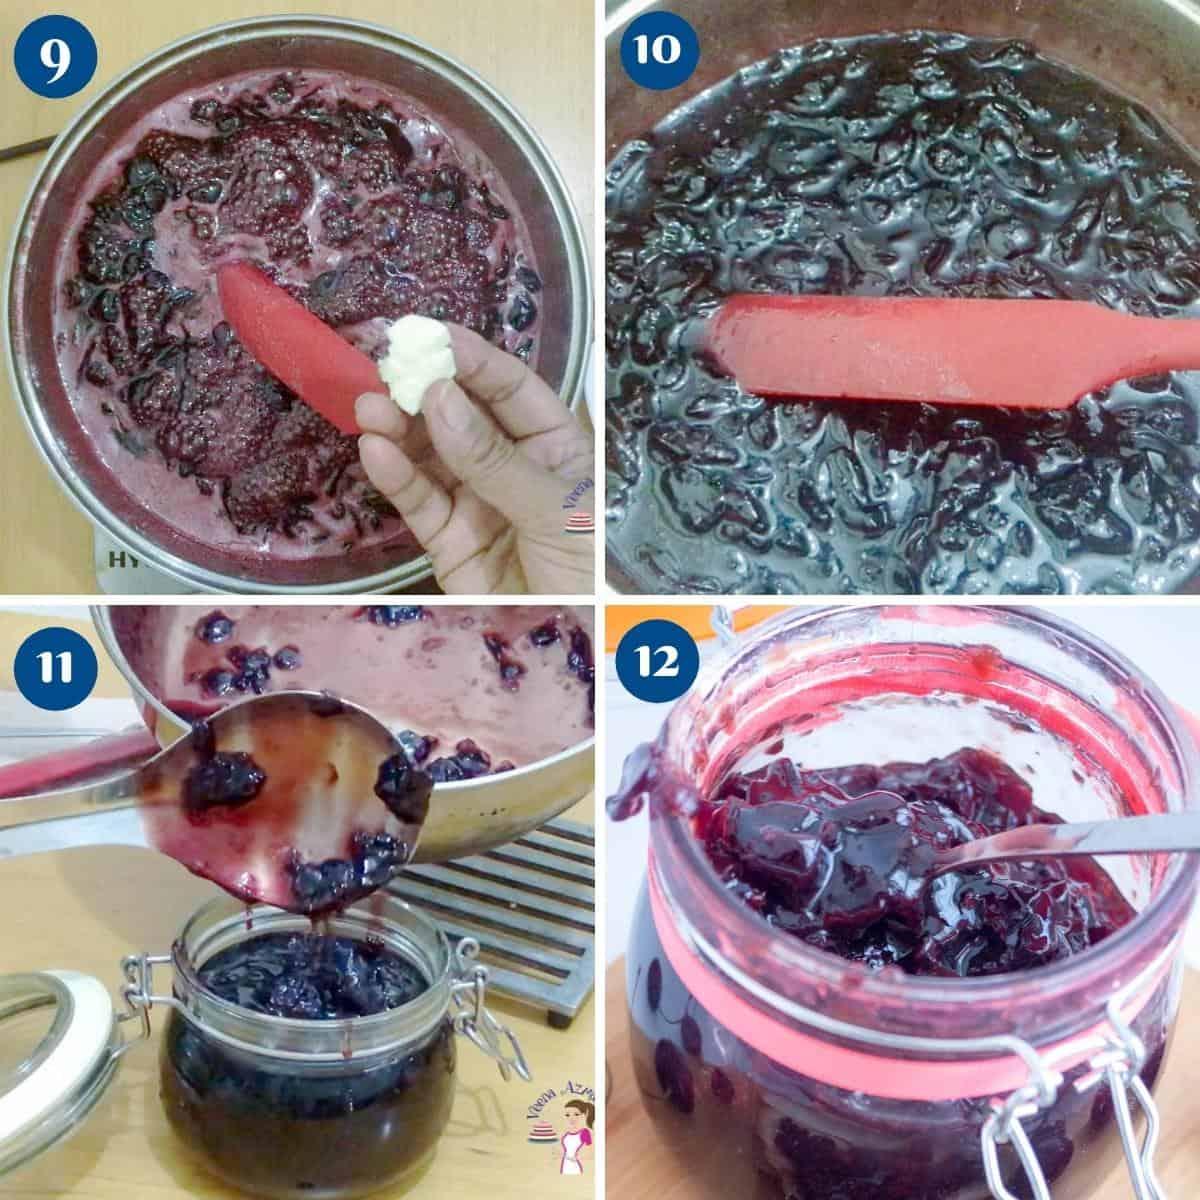 Progress pictures for cherry jam with no pectin.